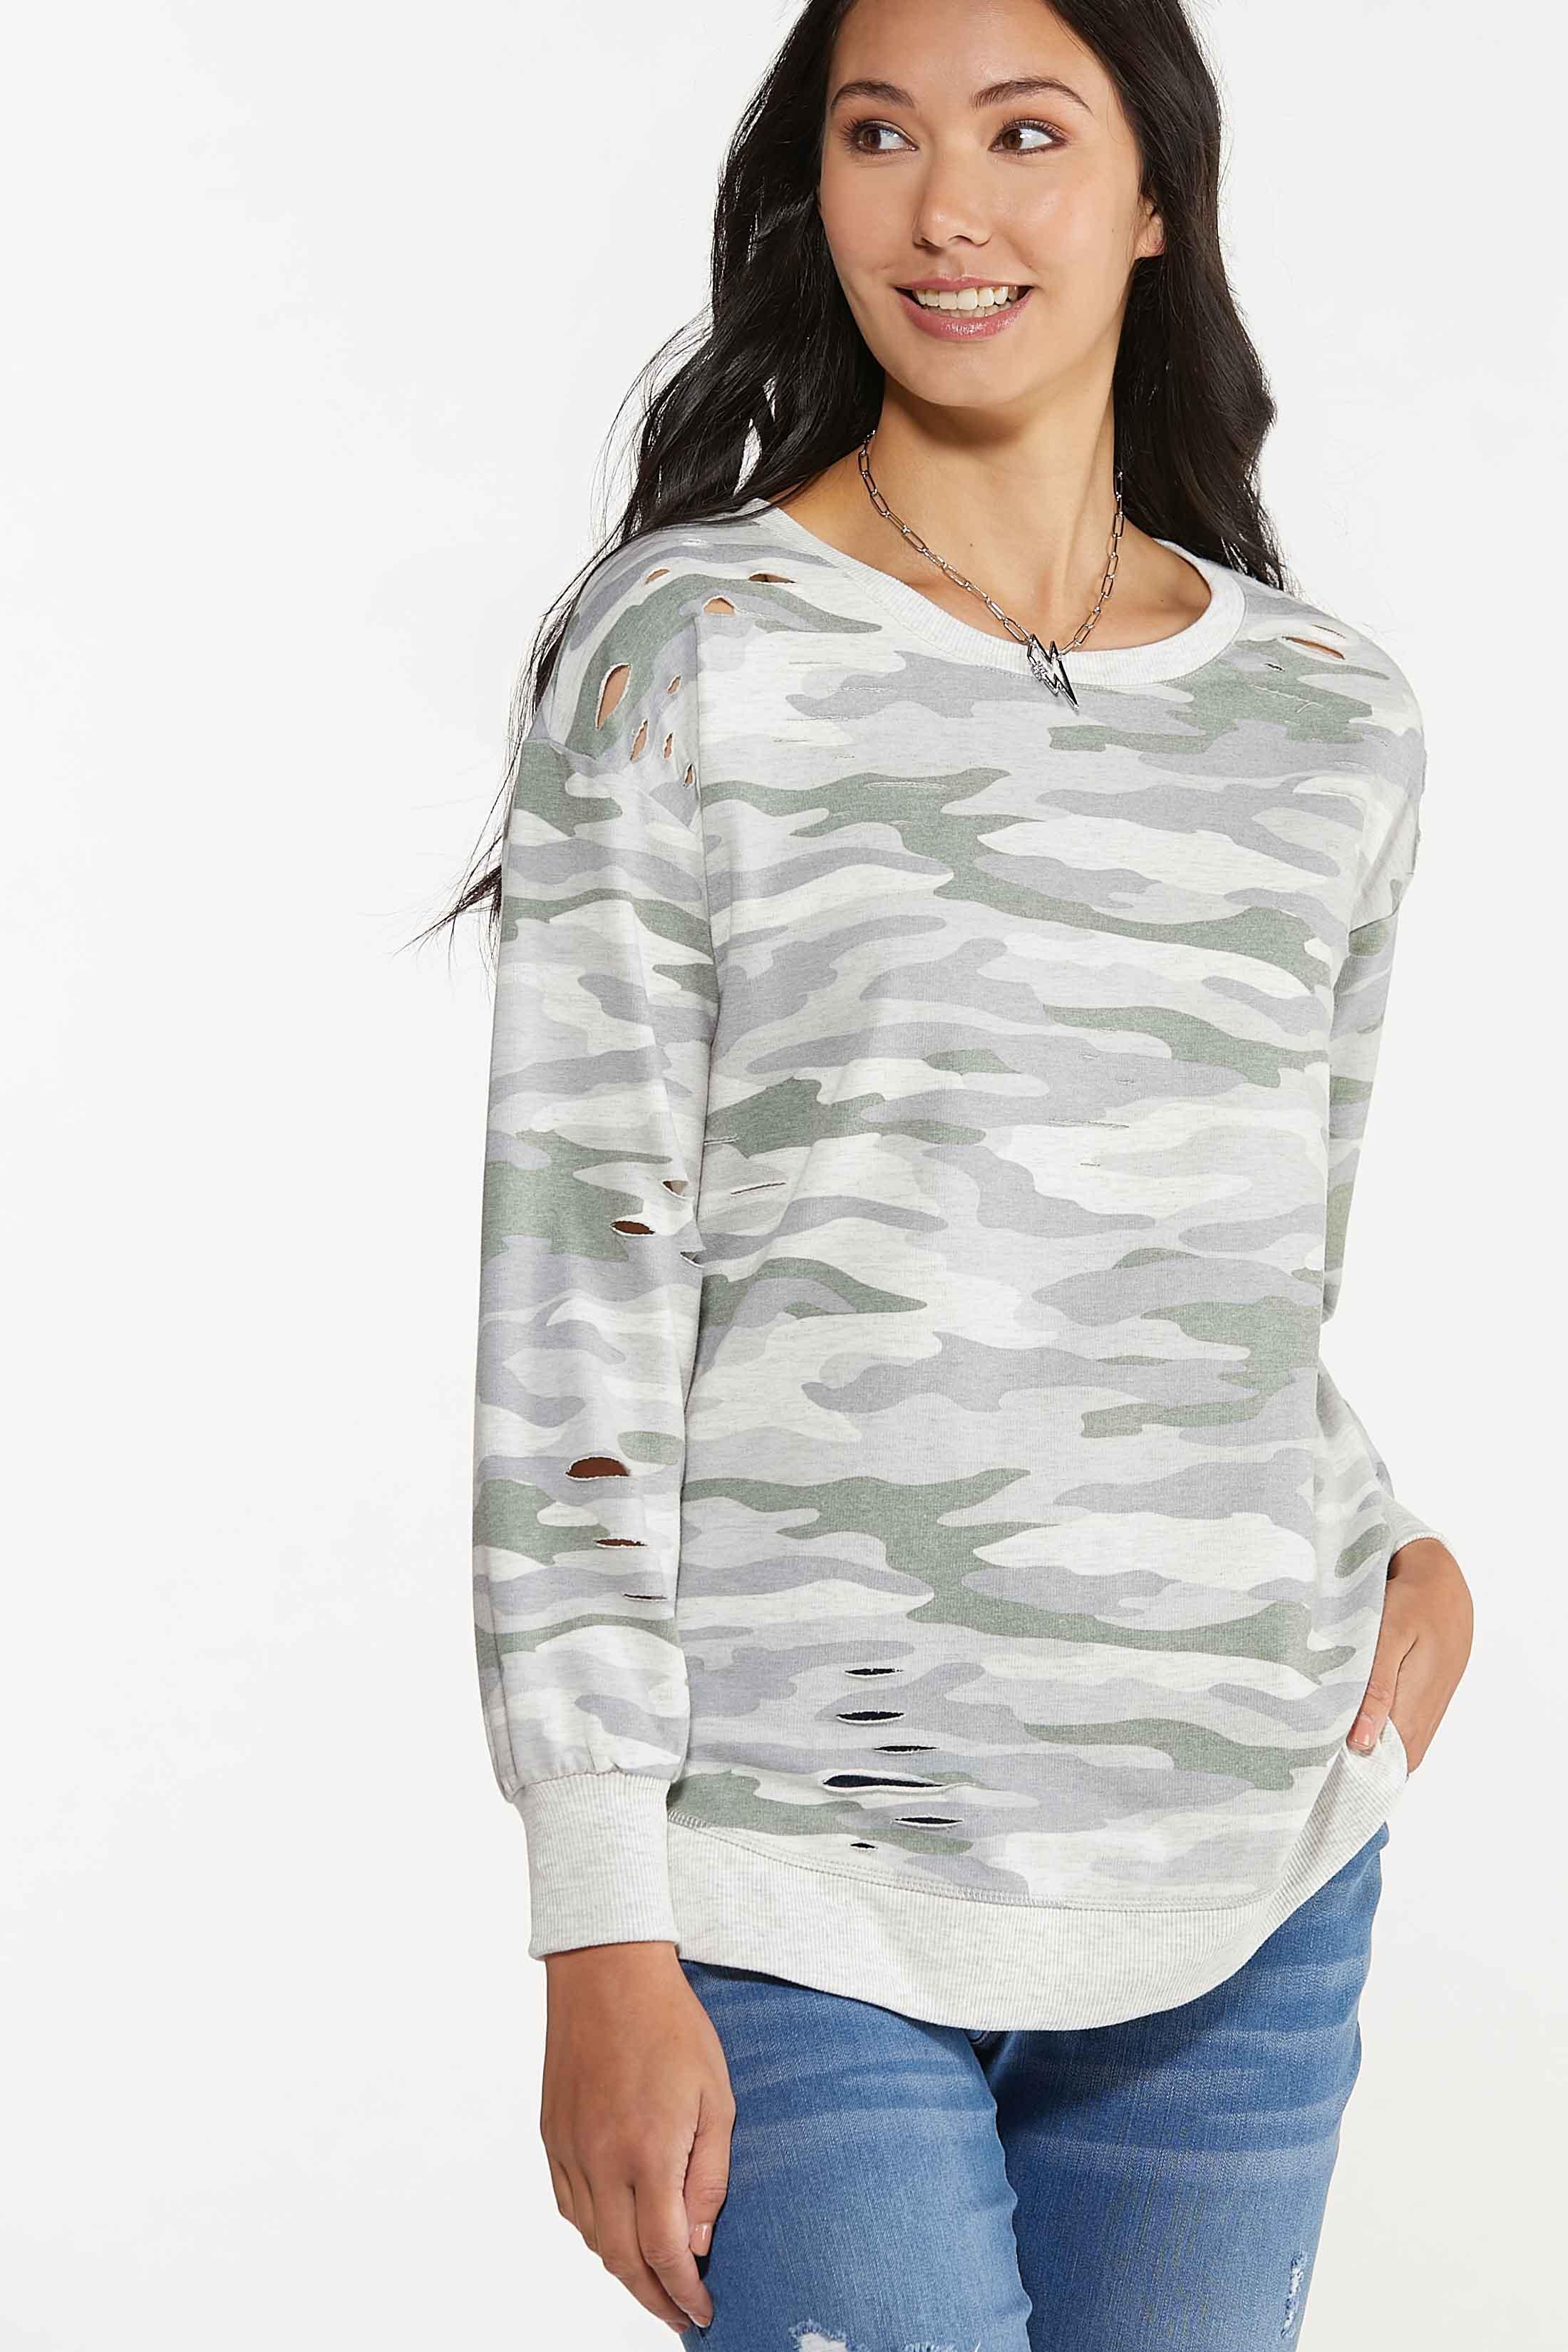 Distressed Camo Sweatshirt (Item #44682190)